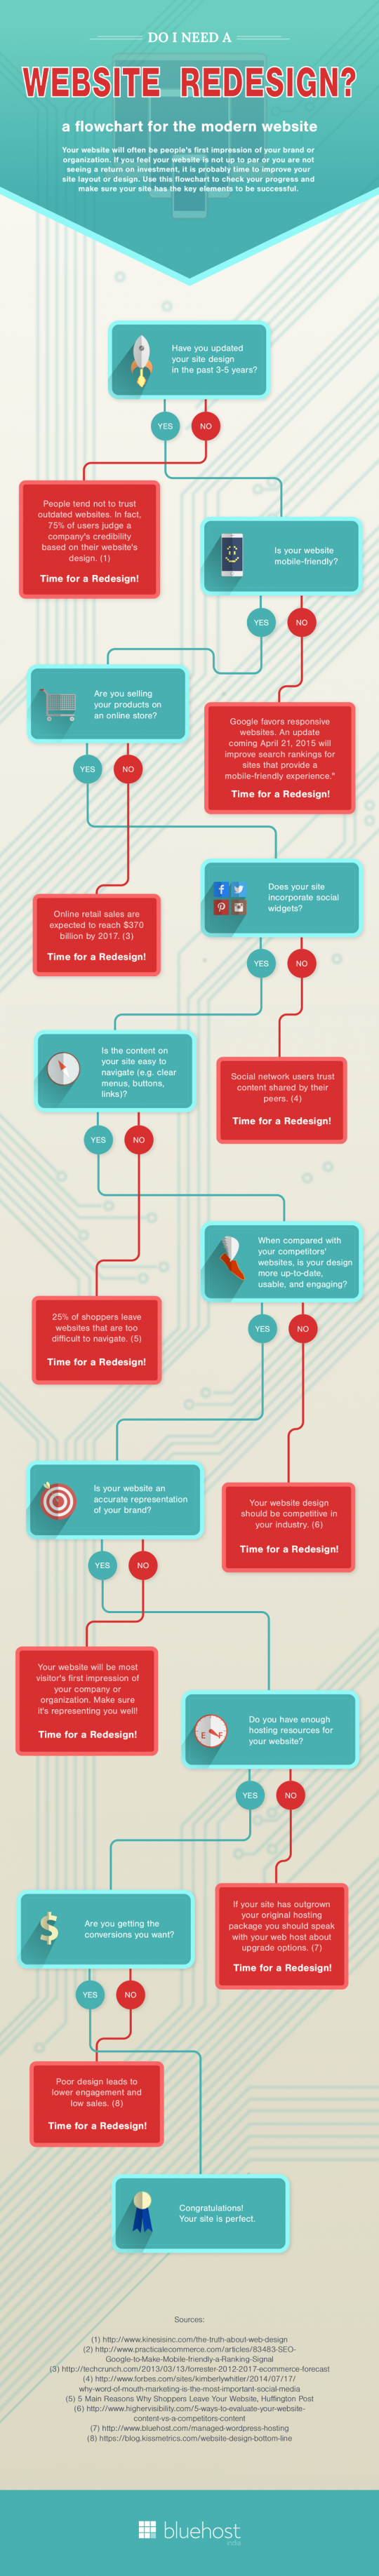 How Often Should I Update My Website? Reasons For Website Redesign 1